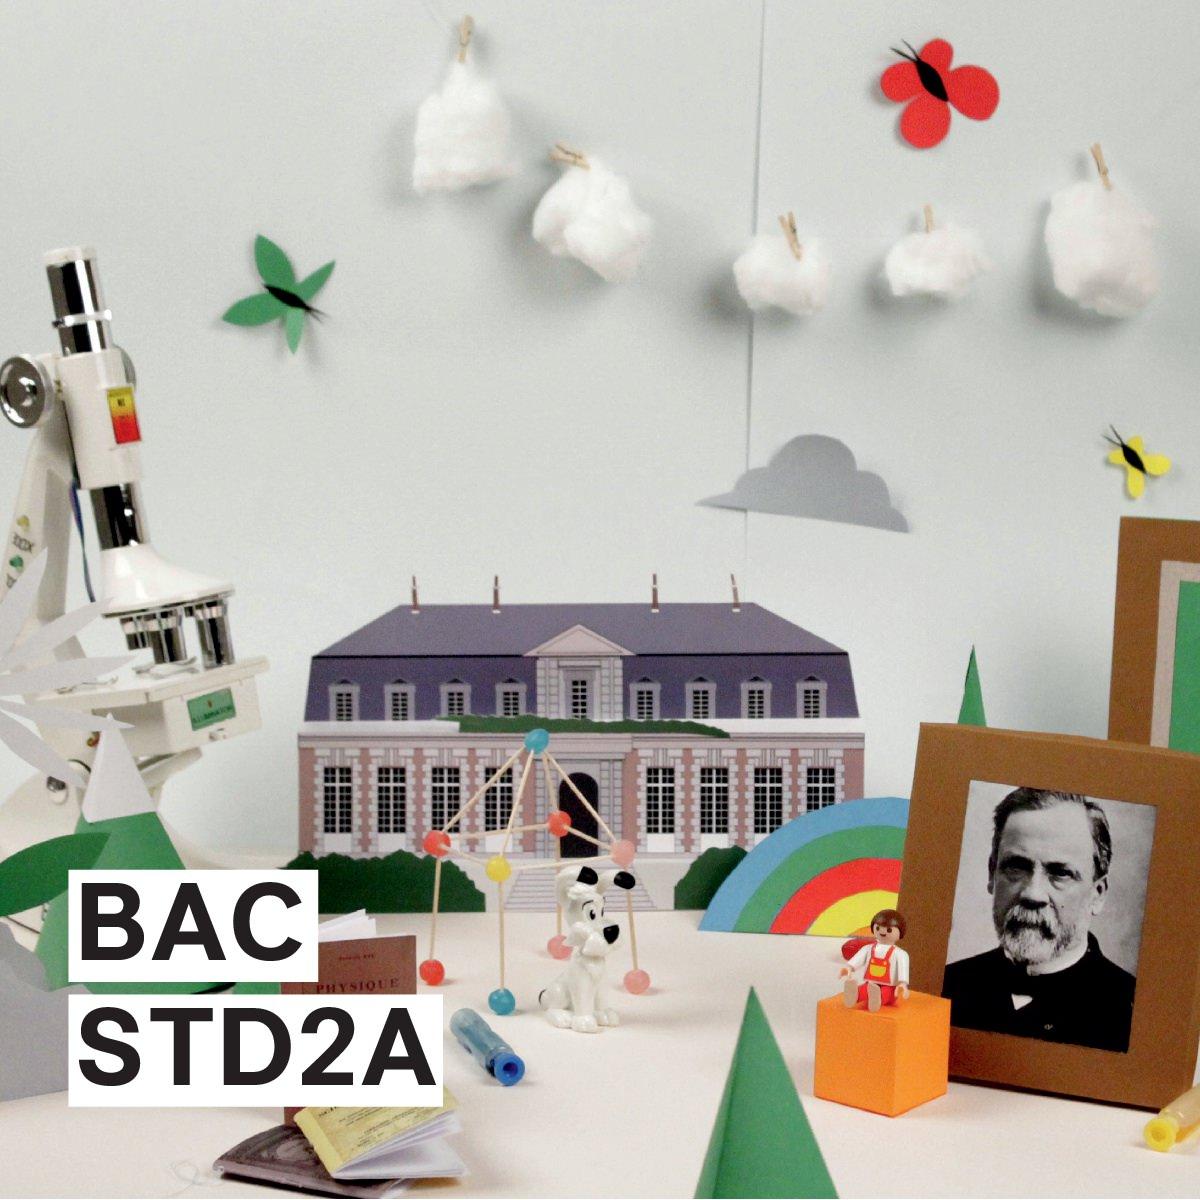 Bellecour Ecole - Bac STD2A